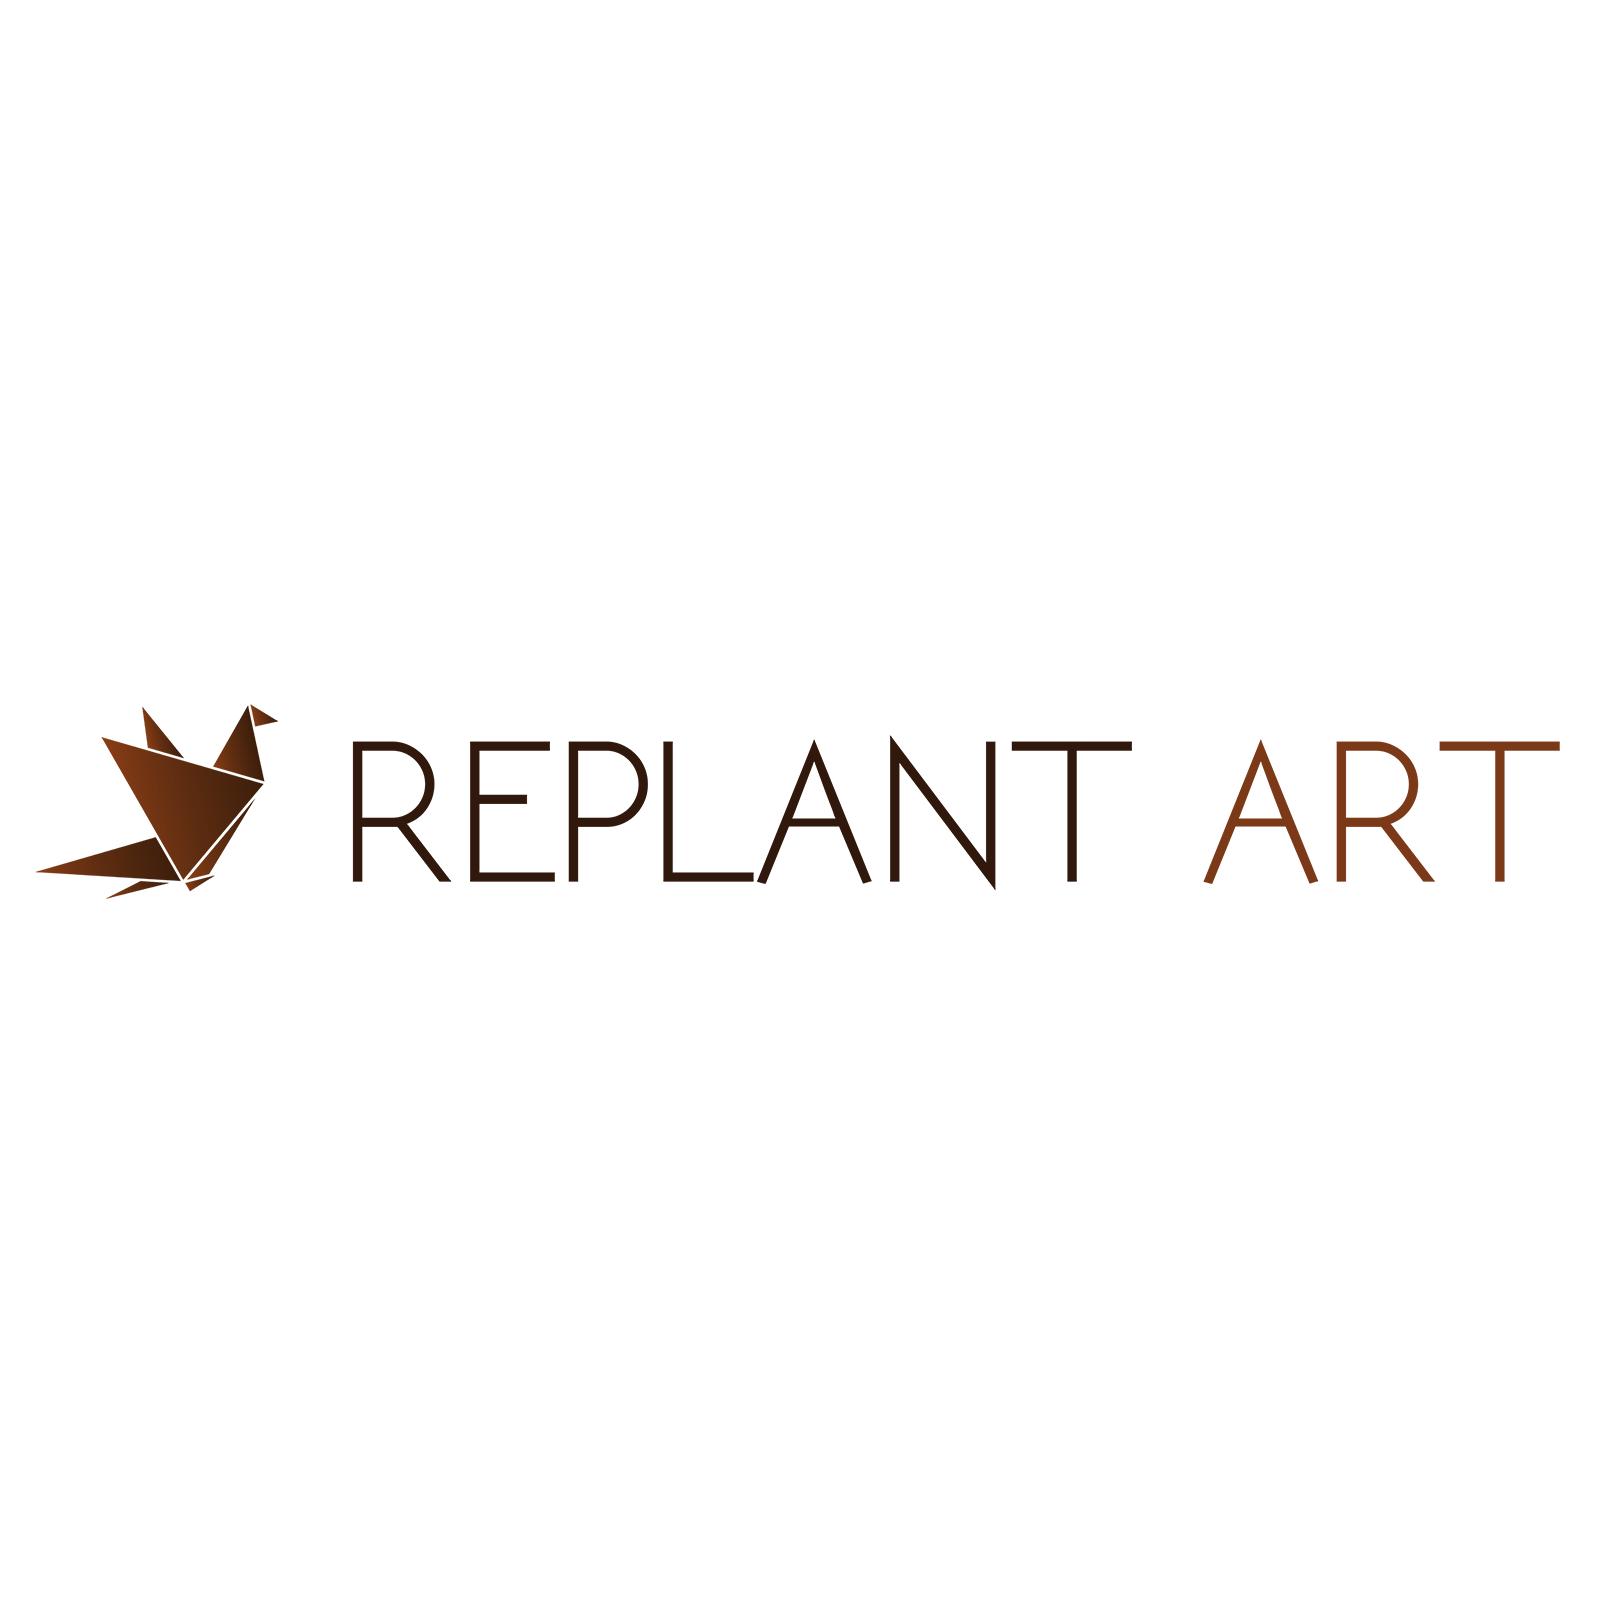 RePlant Art - mpm design - logo